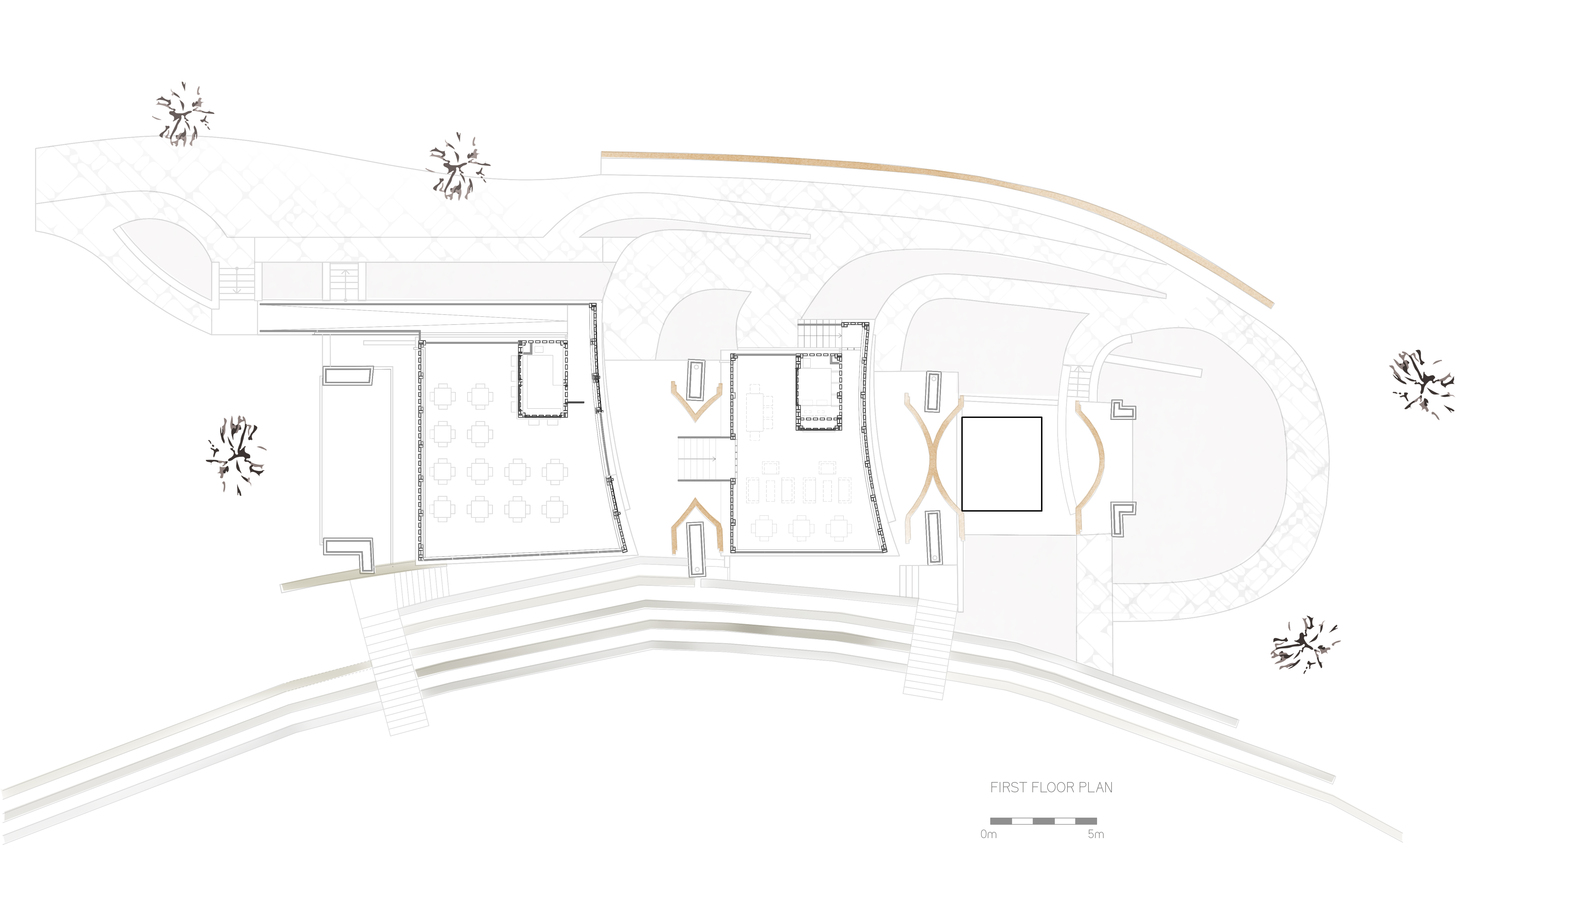 rwanda cricket stadium light earth designs [ 1582 x 909 Pixel ]